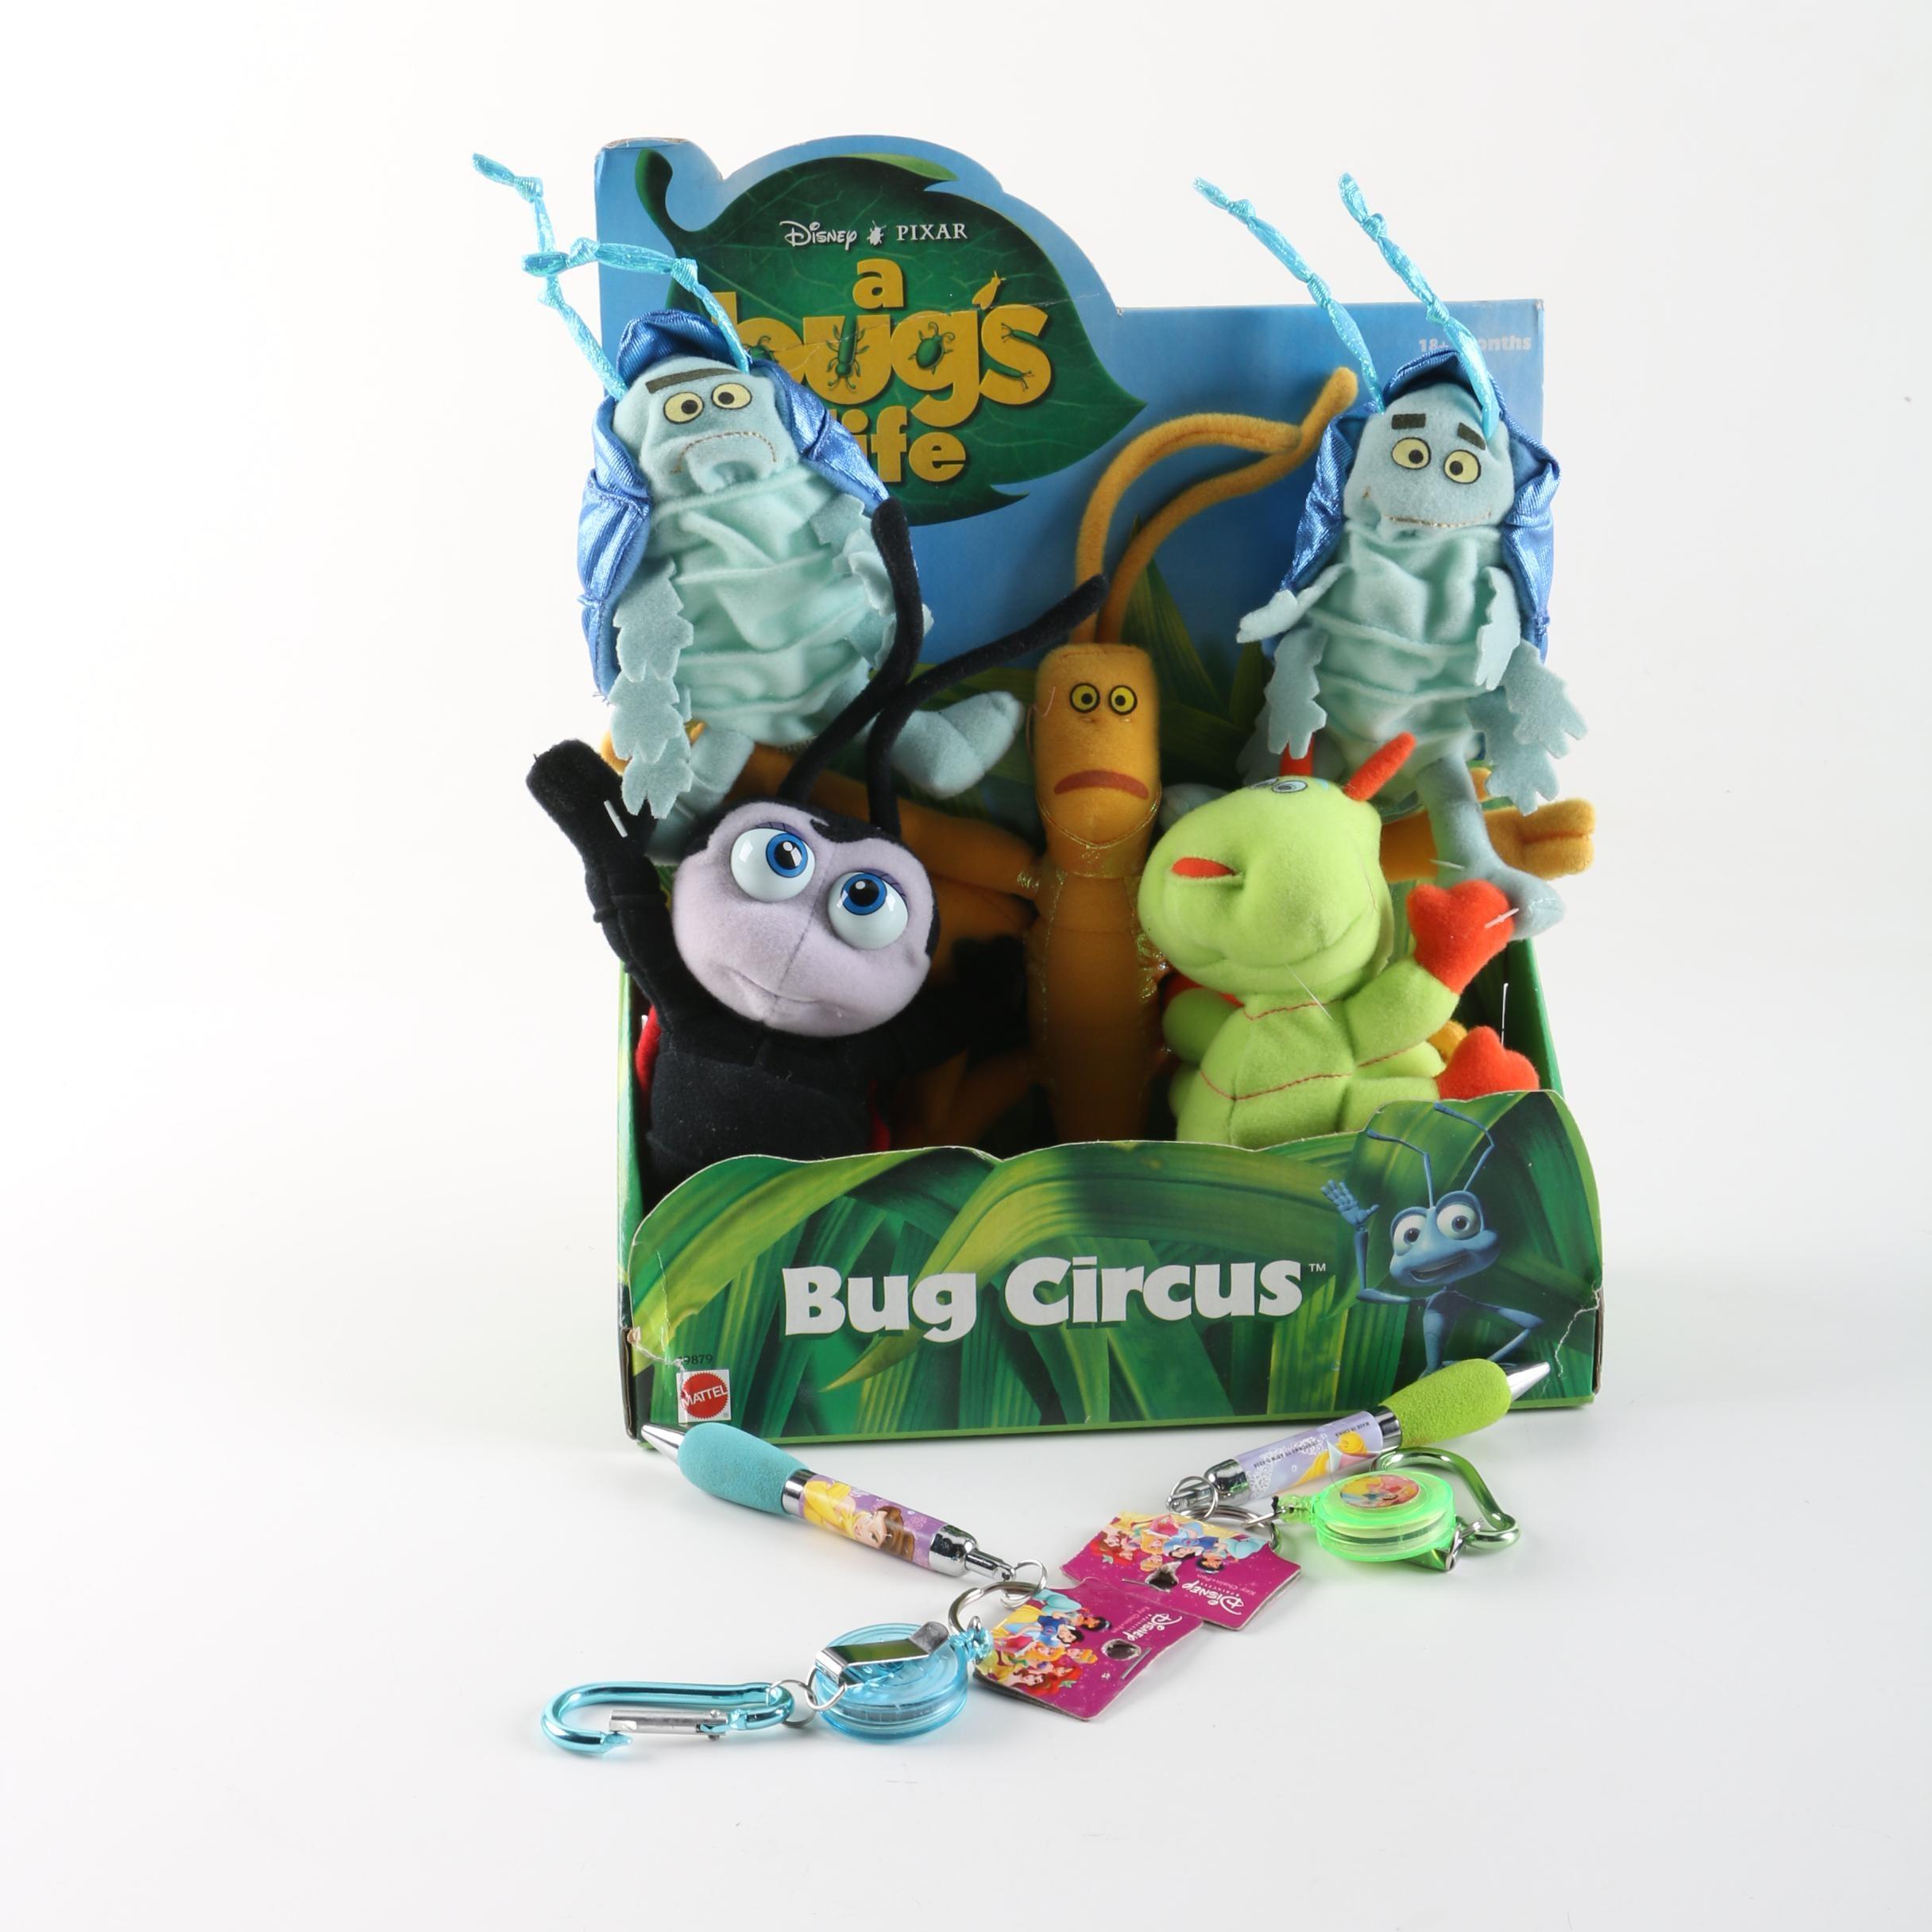 "Disney-Pixar ""A Bug's Life"" Play Set and Disney Princess Key Chains"